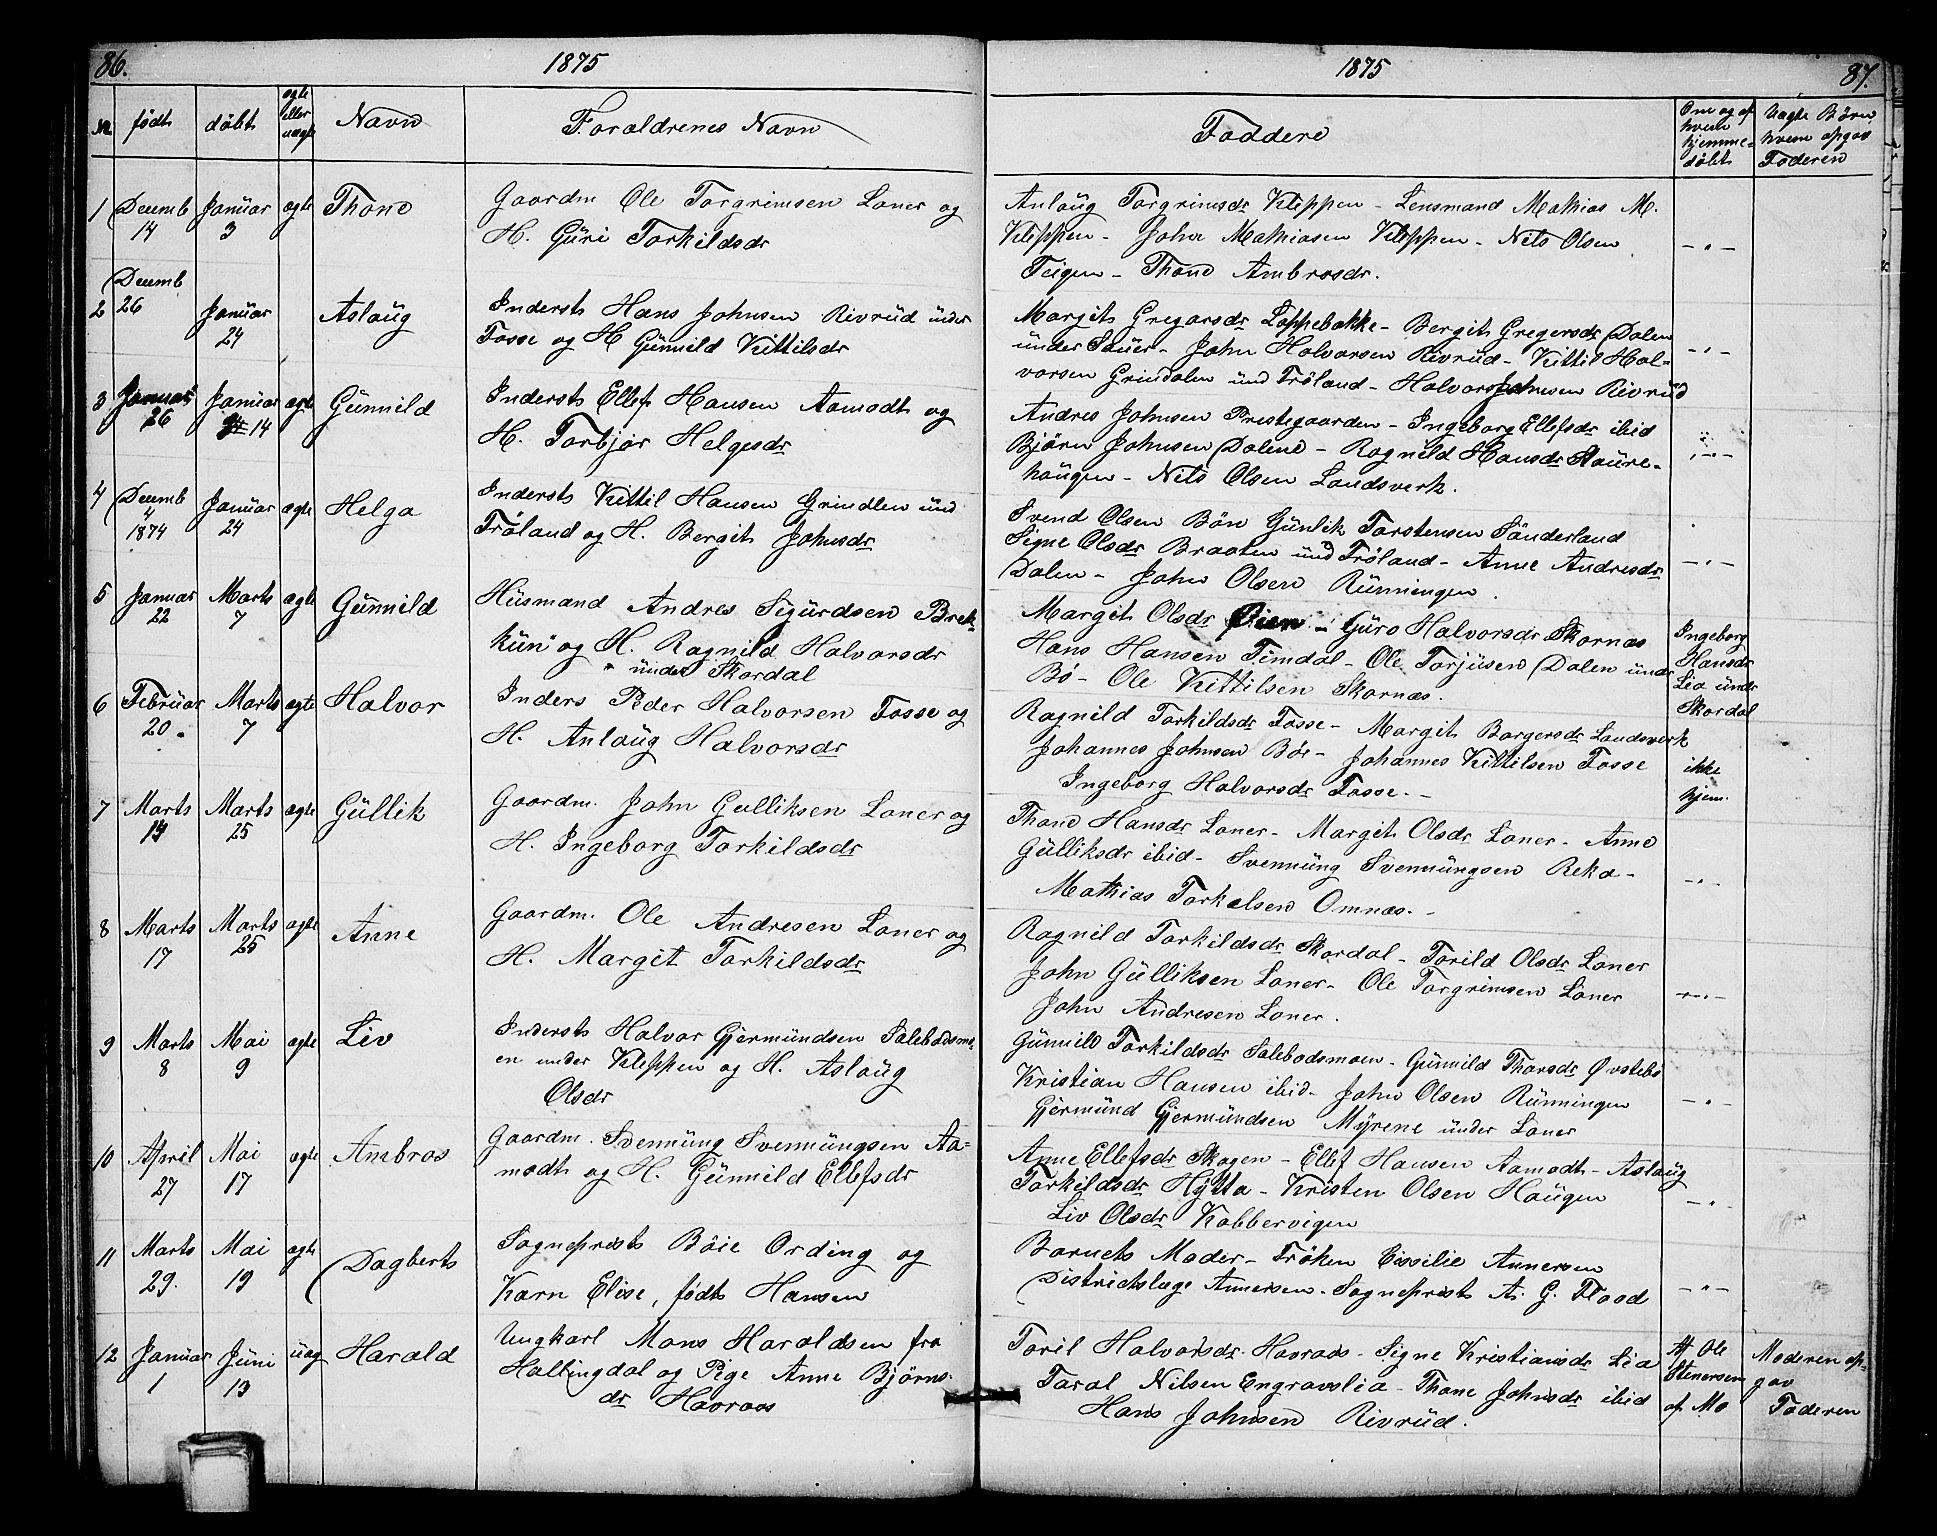 SAKO, Hjartdal kirkebøker, G/Gb/L0002: Klokkerbok nr. II 2, 1854-1884, s. 86-87